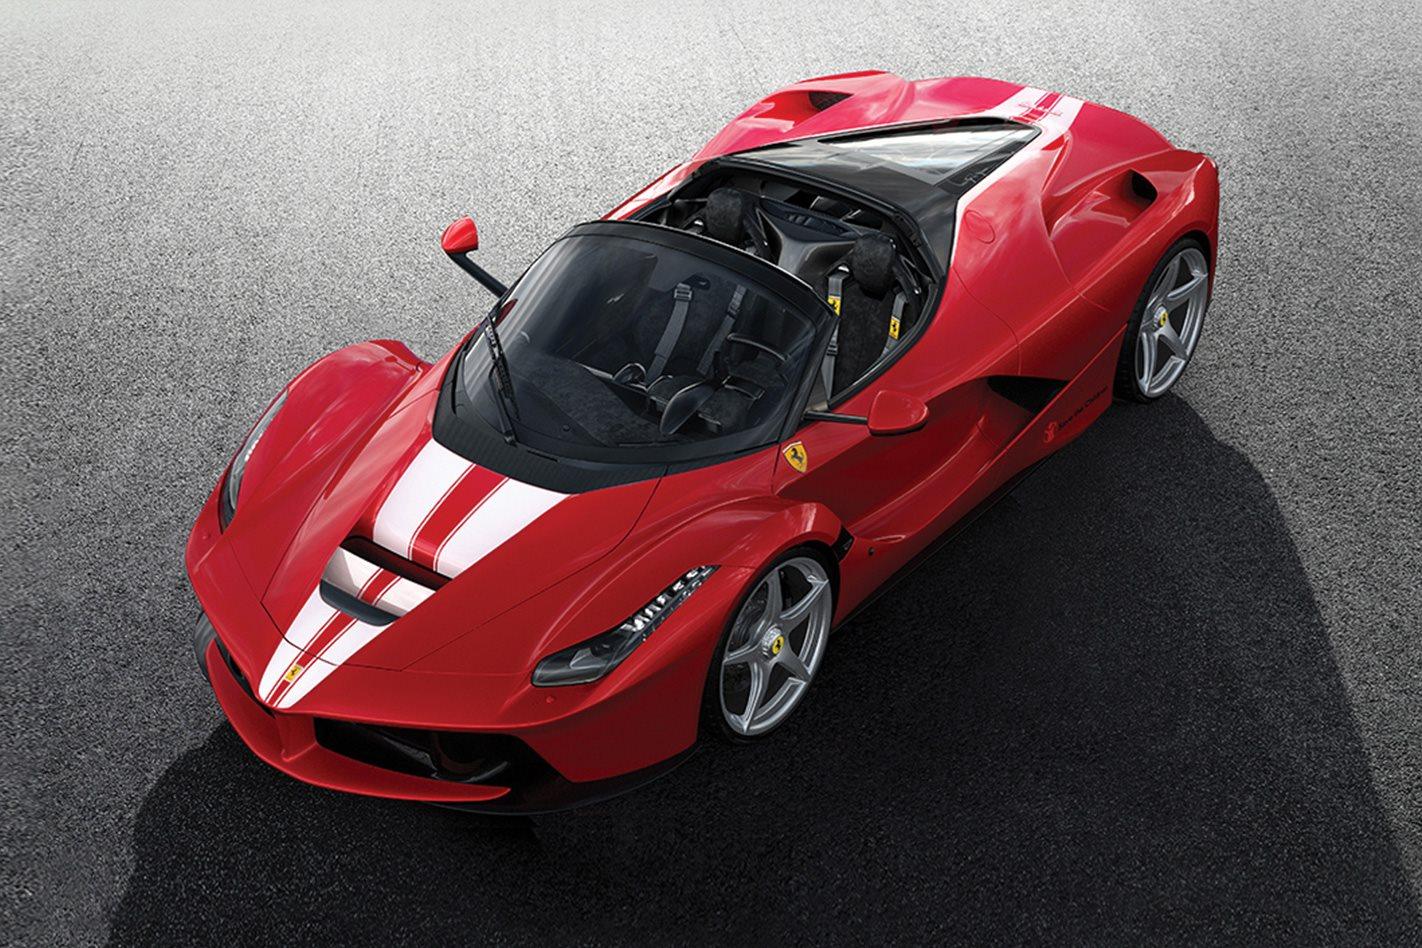 Ferrari Laferrari prototype